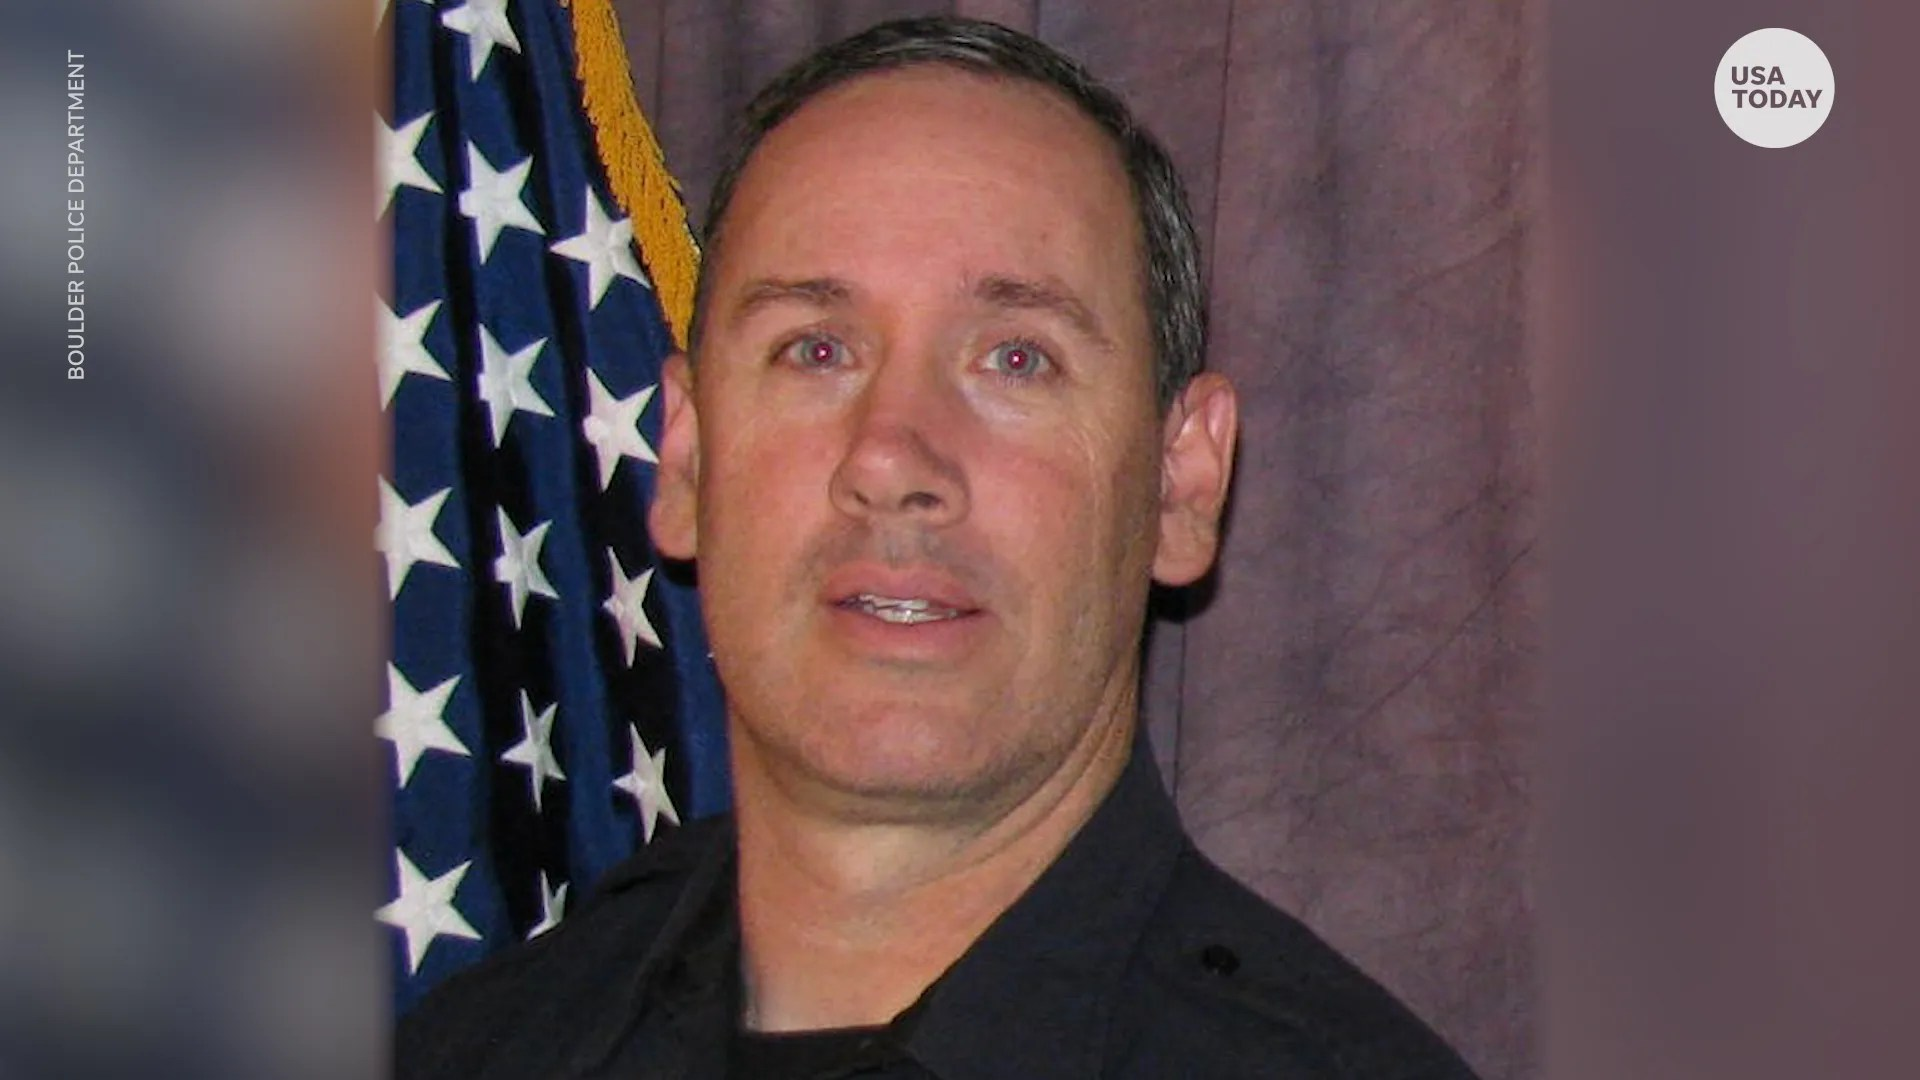 f9395fea 758f 425e 99b6 90c34e8d847e VPC OFFICER KILLED IN BOULDER SHOOTING DESK THUMB